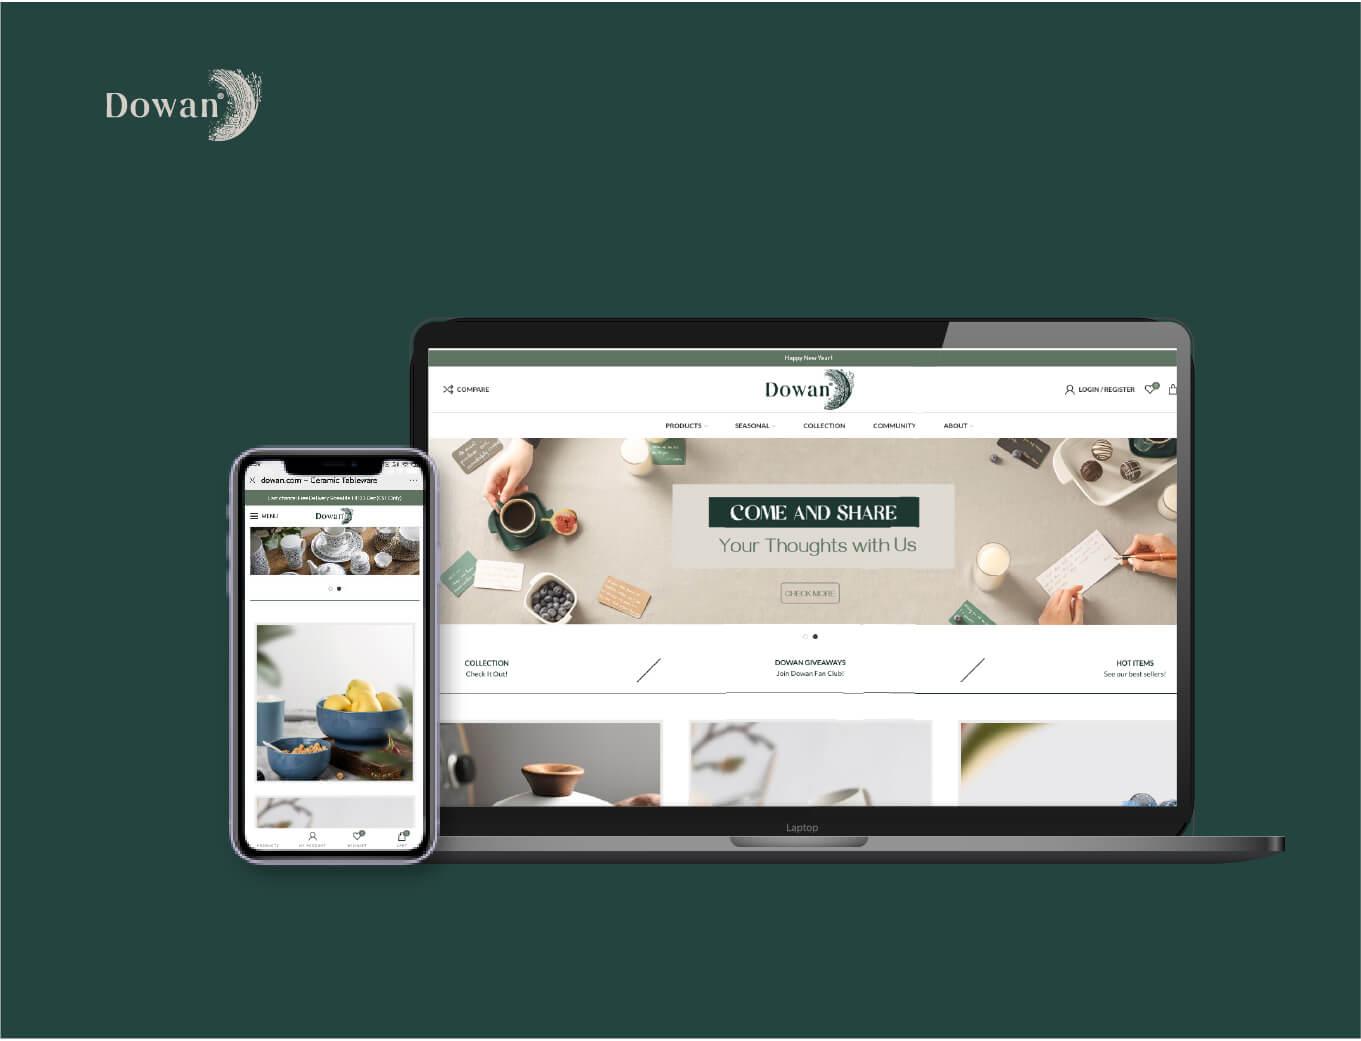 dowan tableware ceramics website advisement designed by orange branding